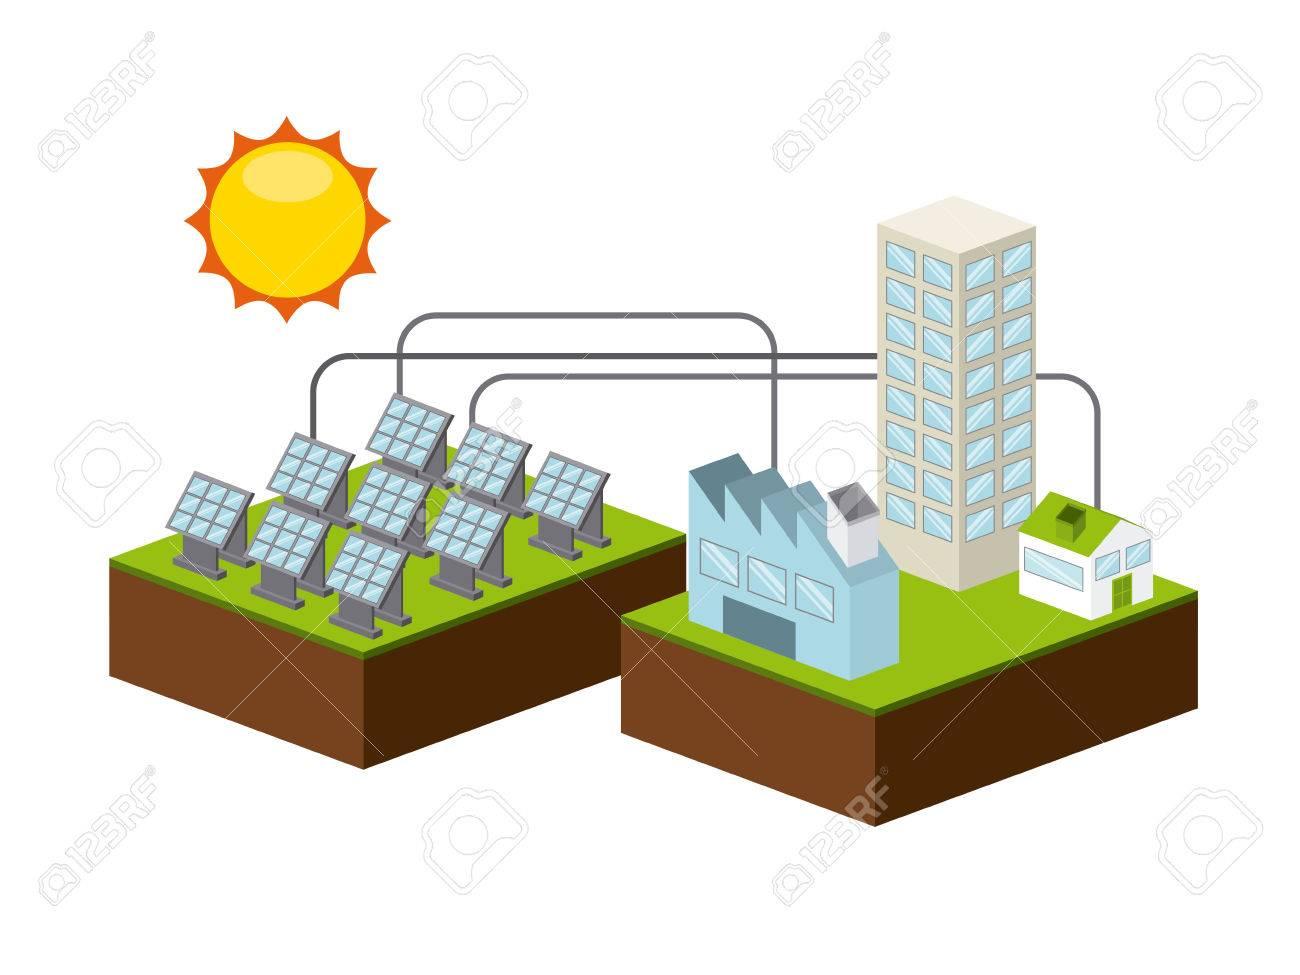 solar energy design, vector illustration - 41702059